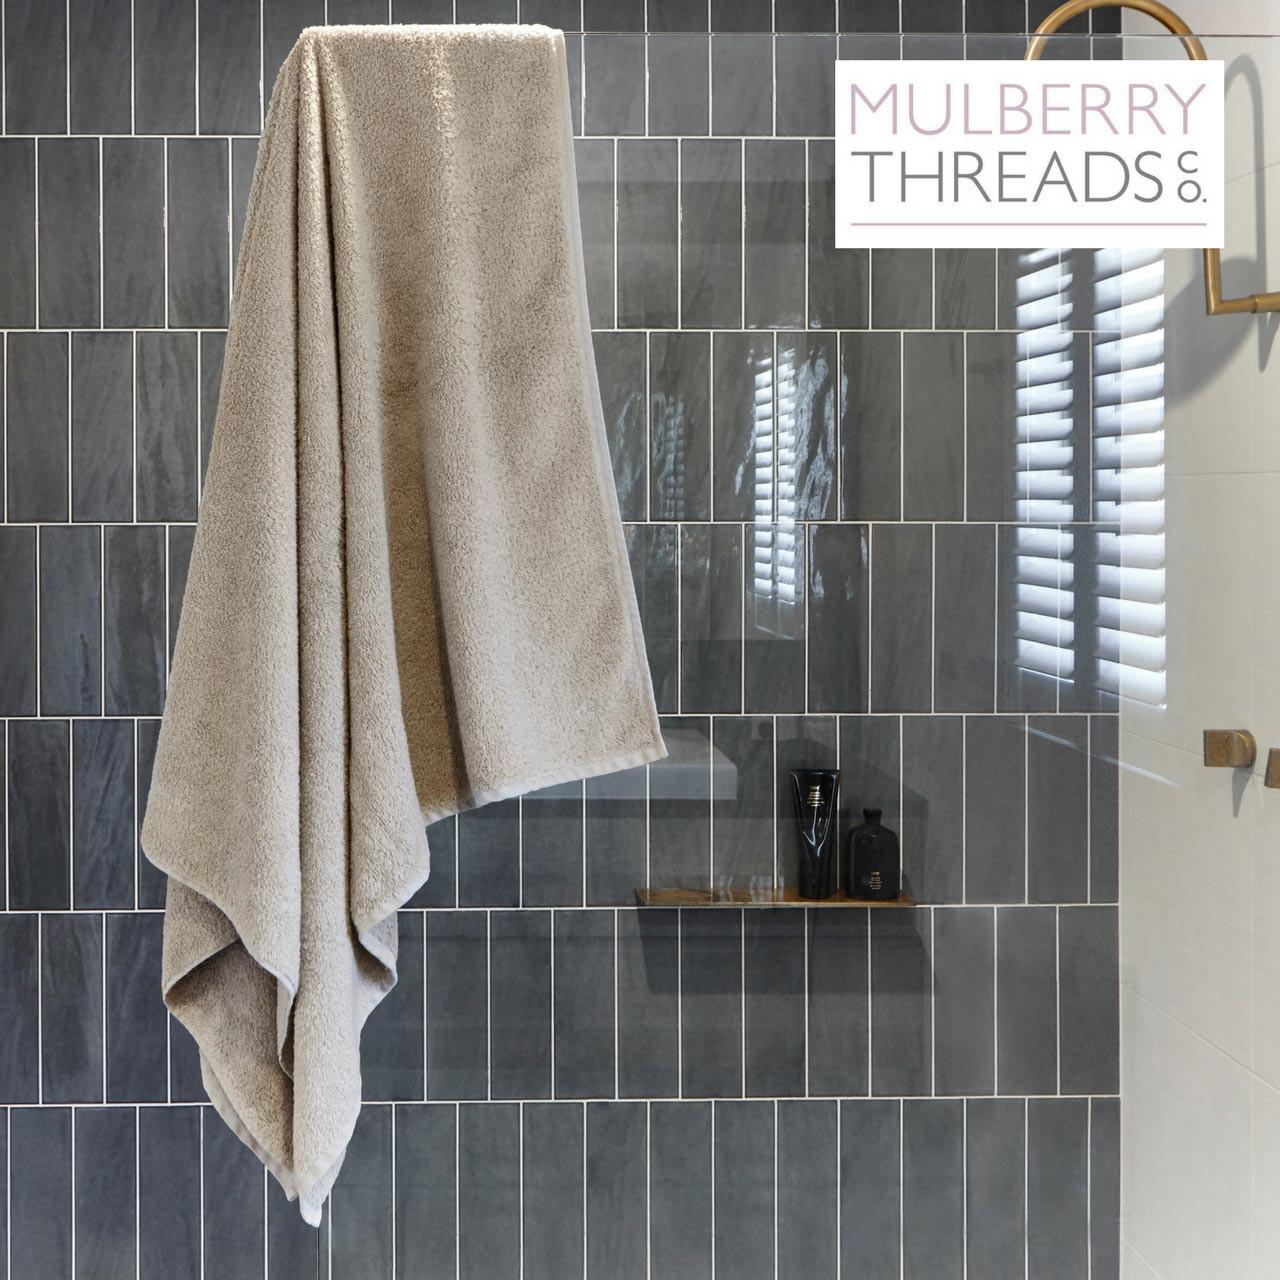 Mulberry Threads Co Bamboo Bath Sheet Bamboo Village